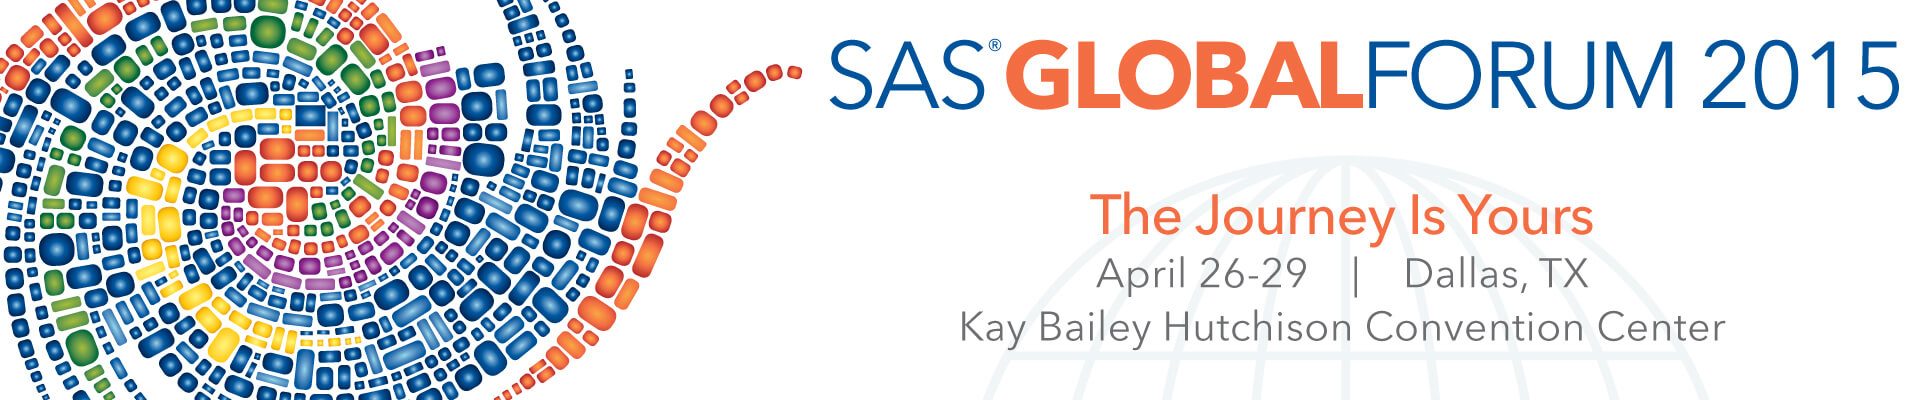 SAS Global Forum 2015 and Cyberanalytics